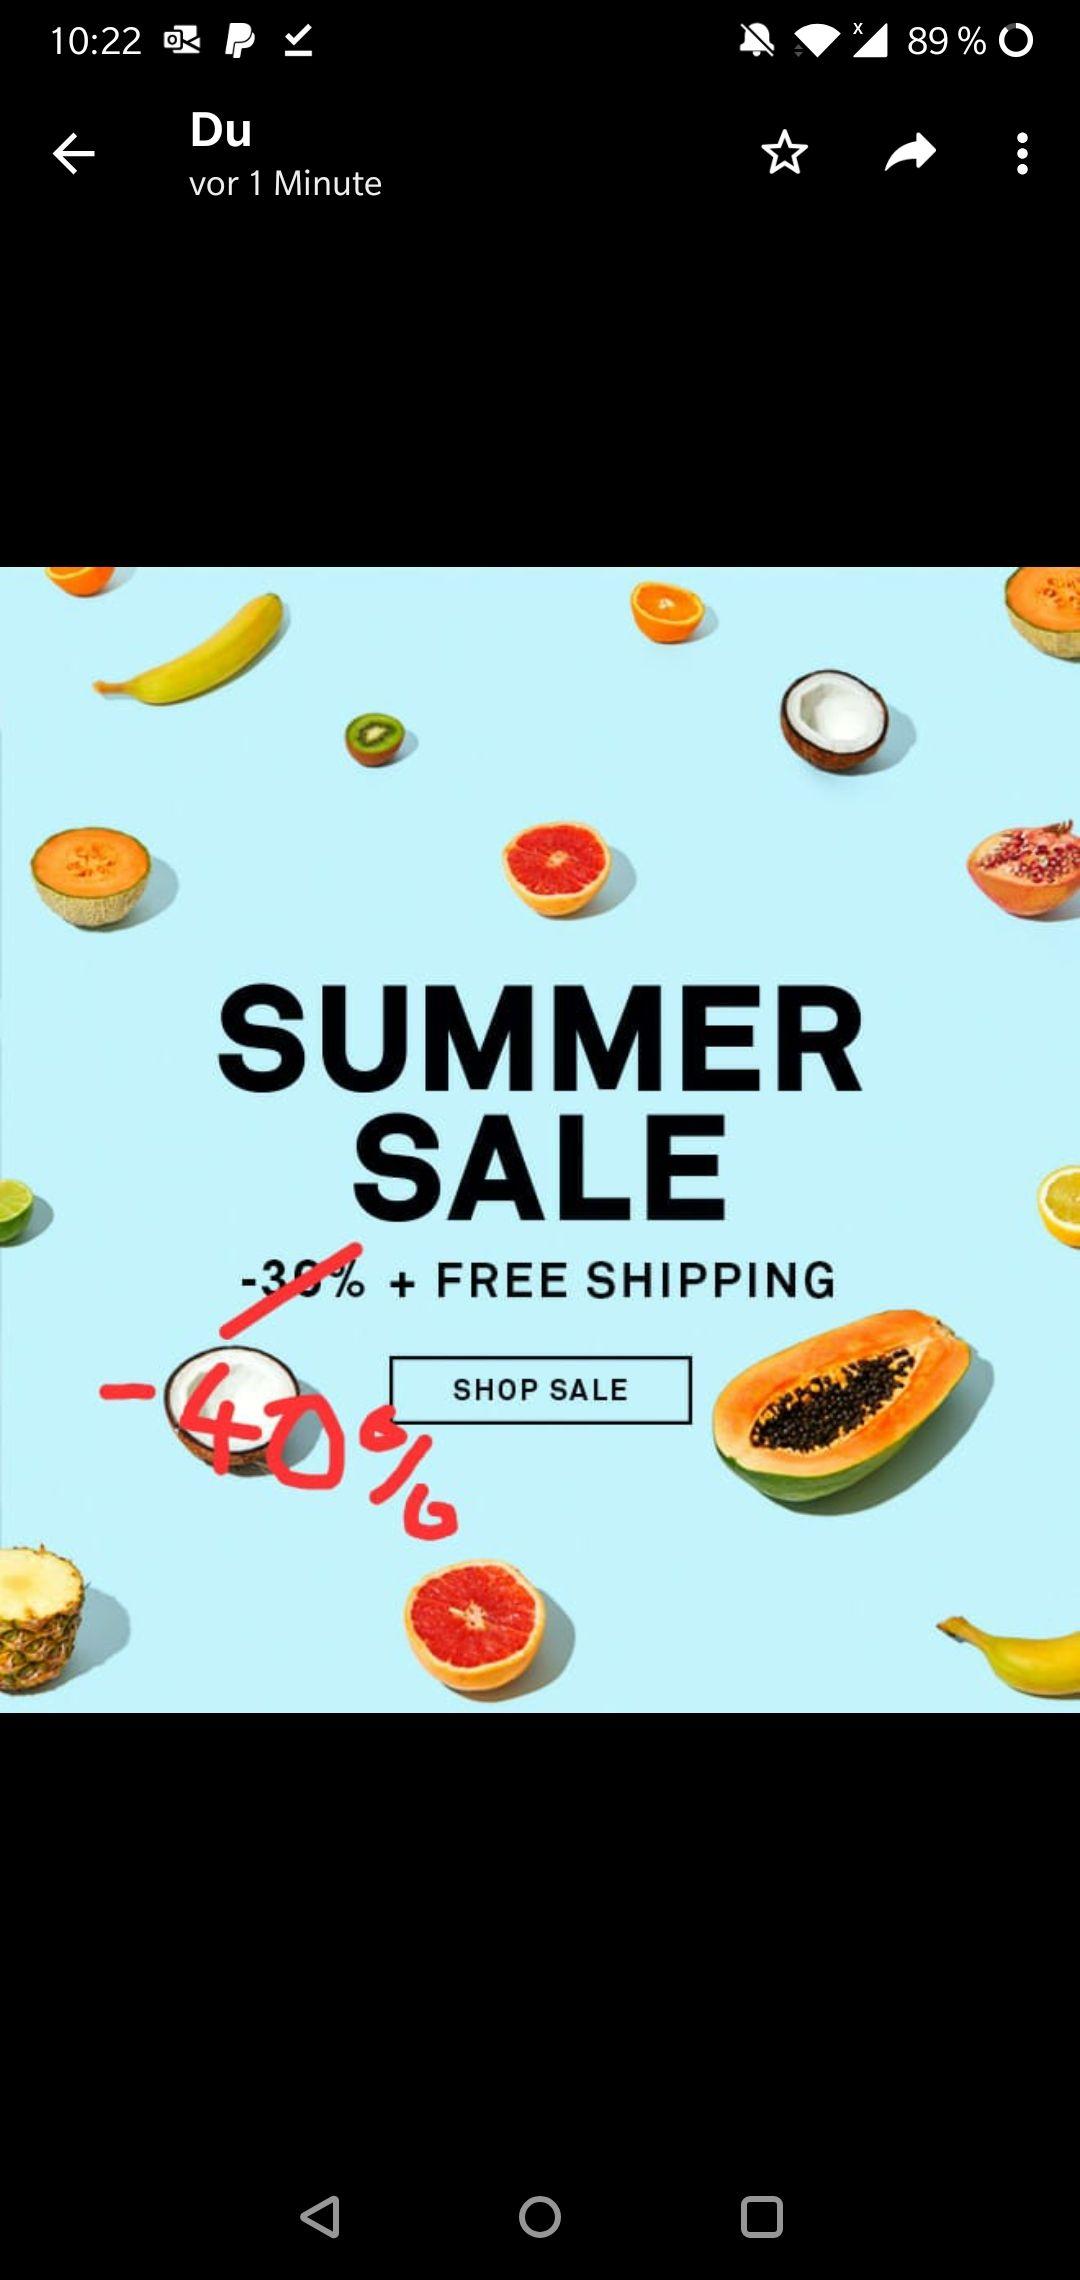 Happy socks -40% summer sale